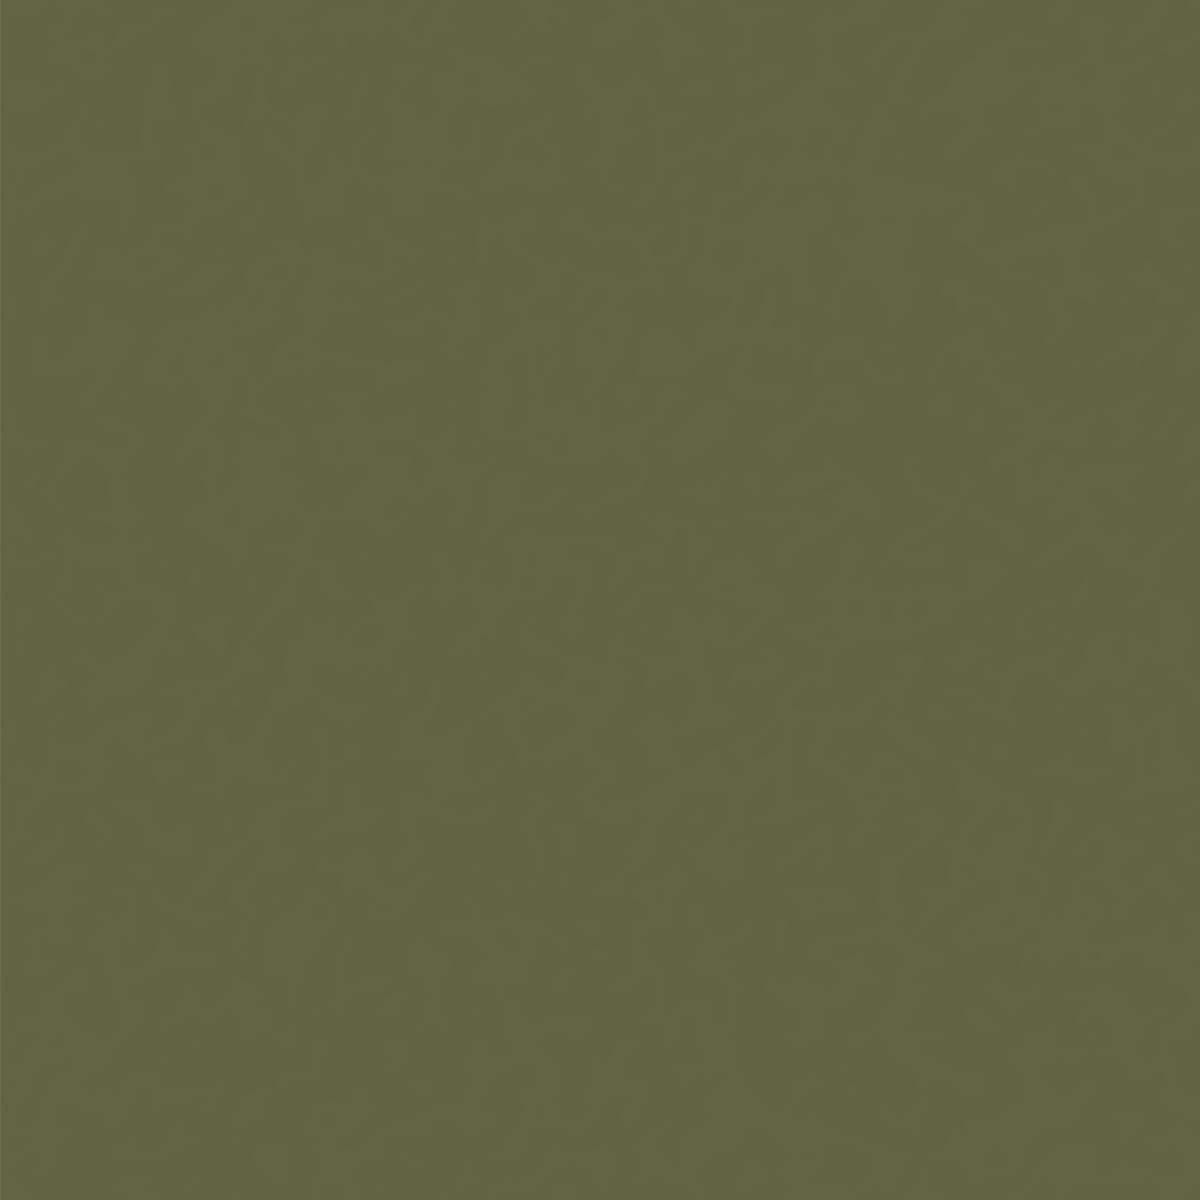 HF1960 VL Olive